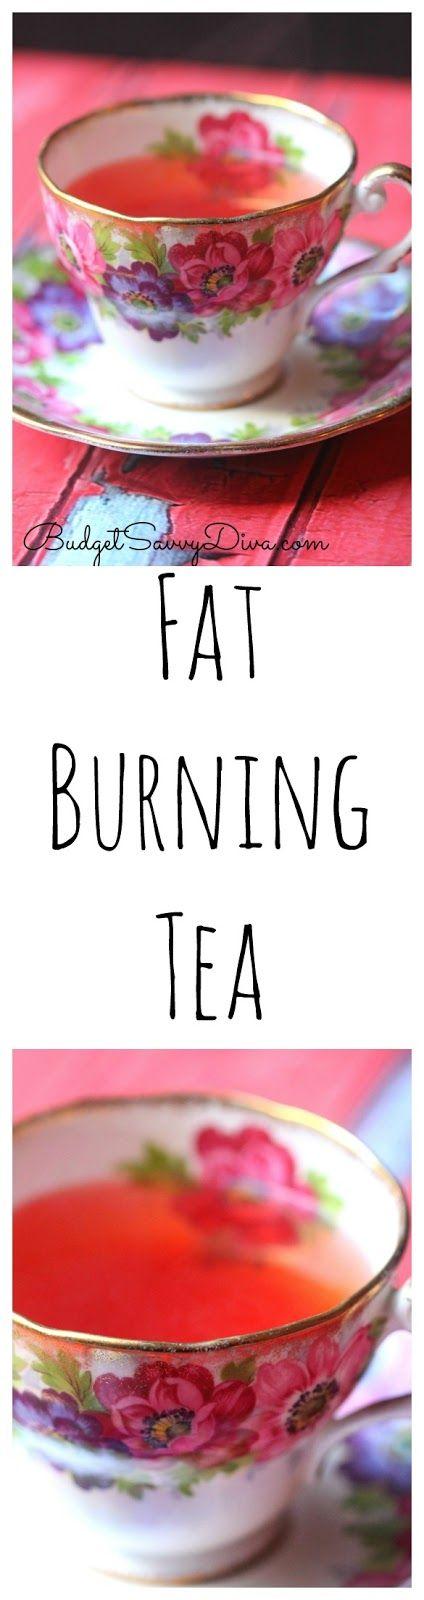 [Fat Burning Tea] + Click For Recipe!  #easy #recipes #weightloss